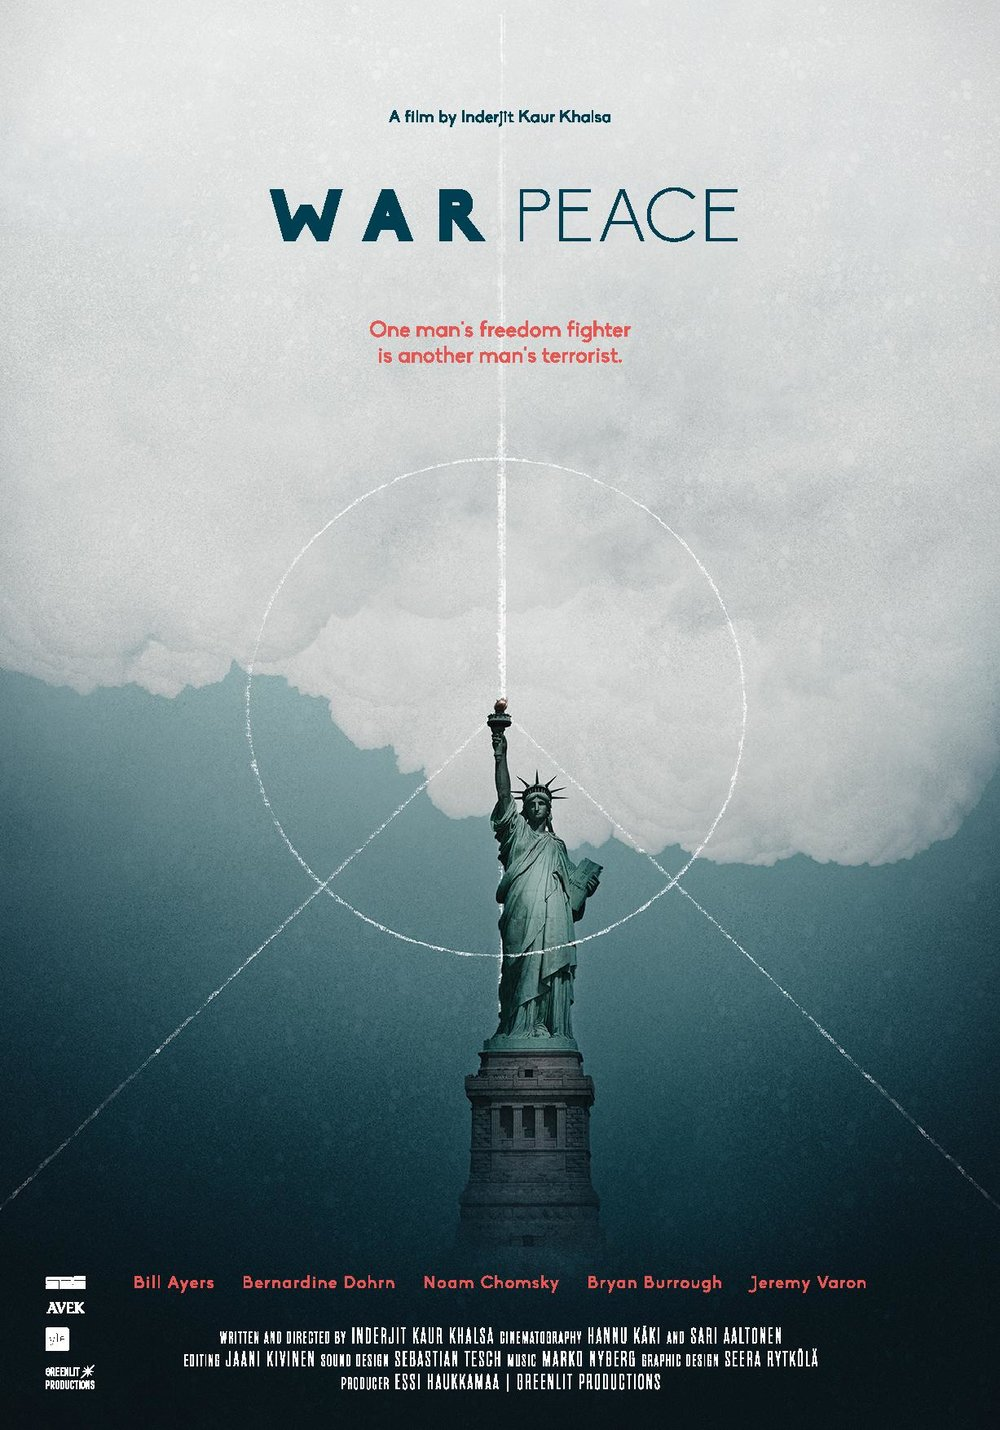 warpeace_poster_rgb_a4-page-001.jpg